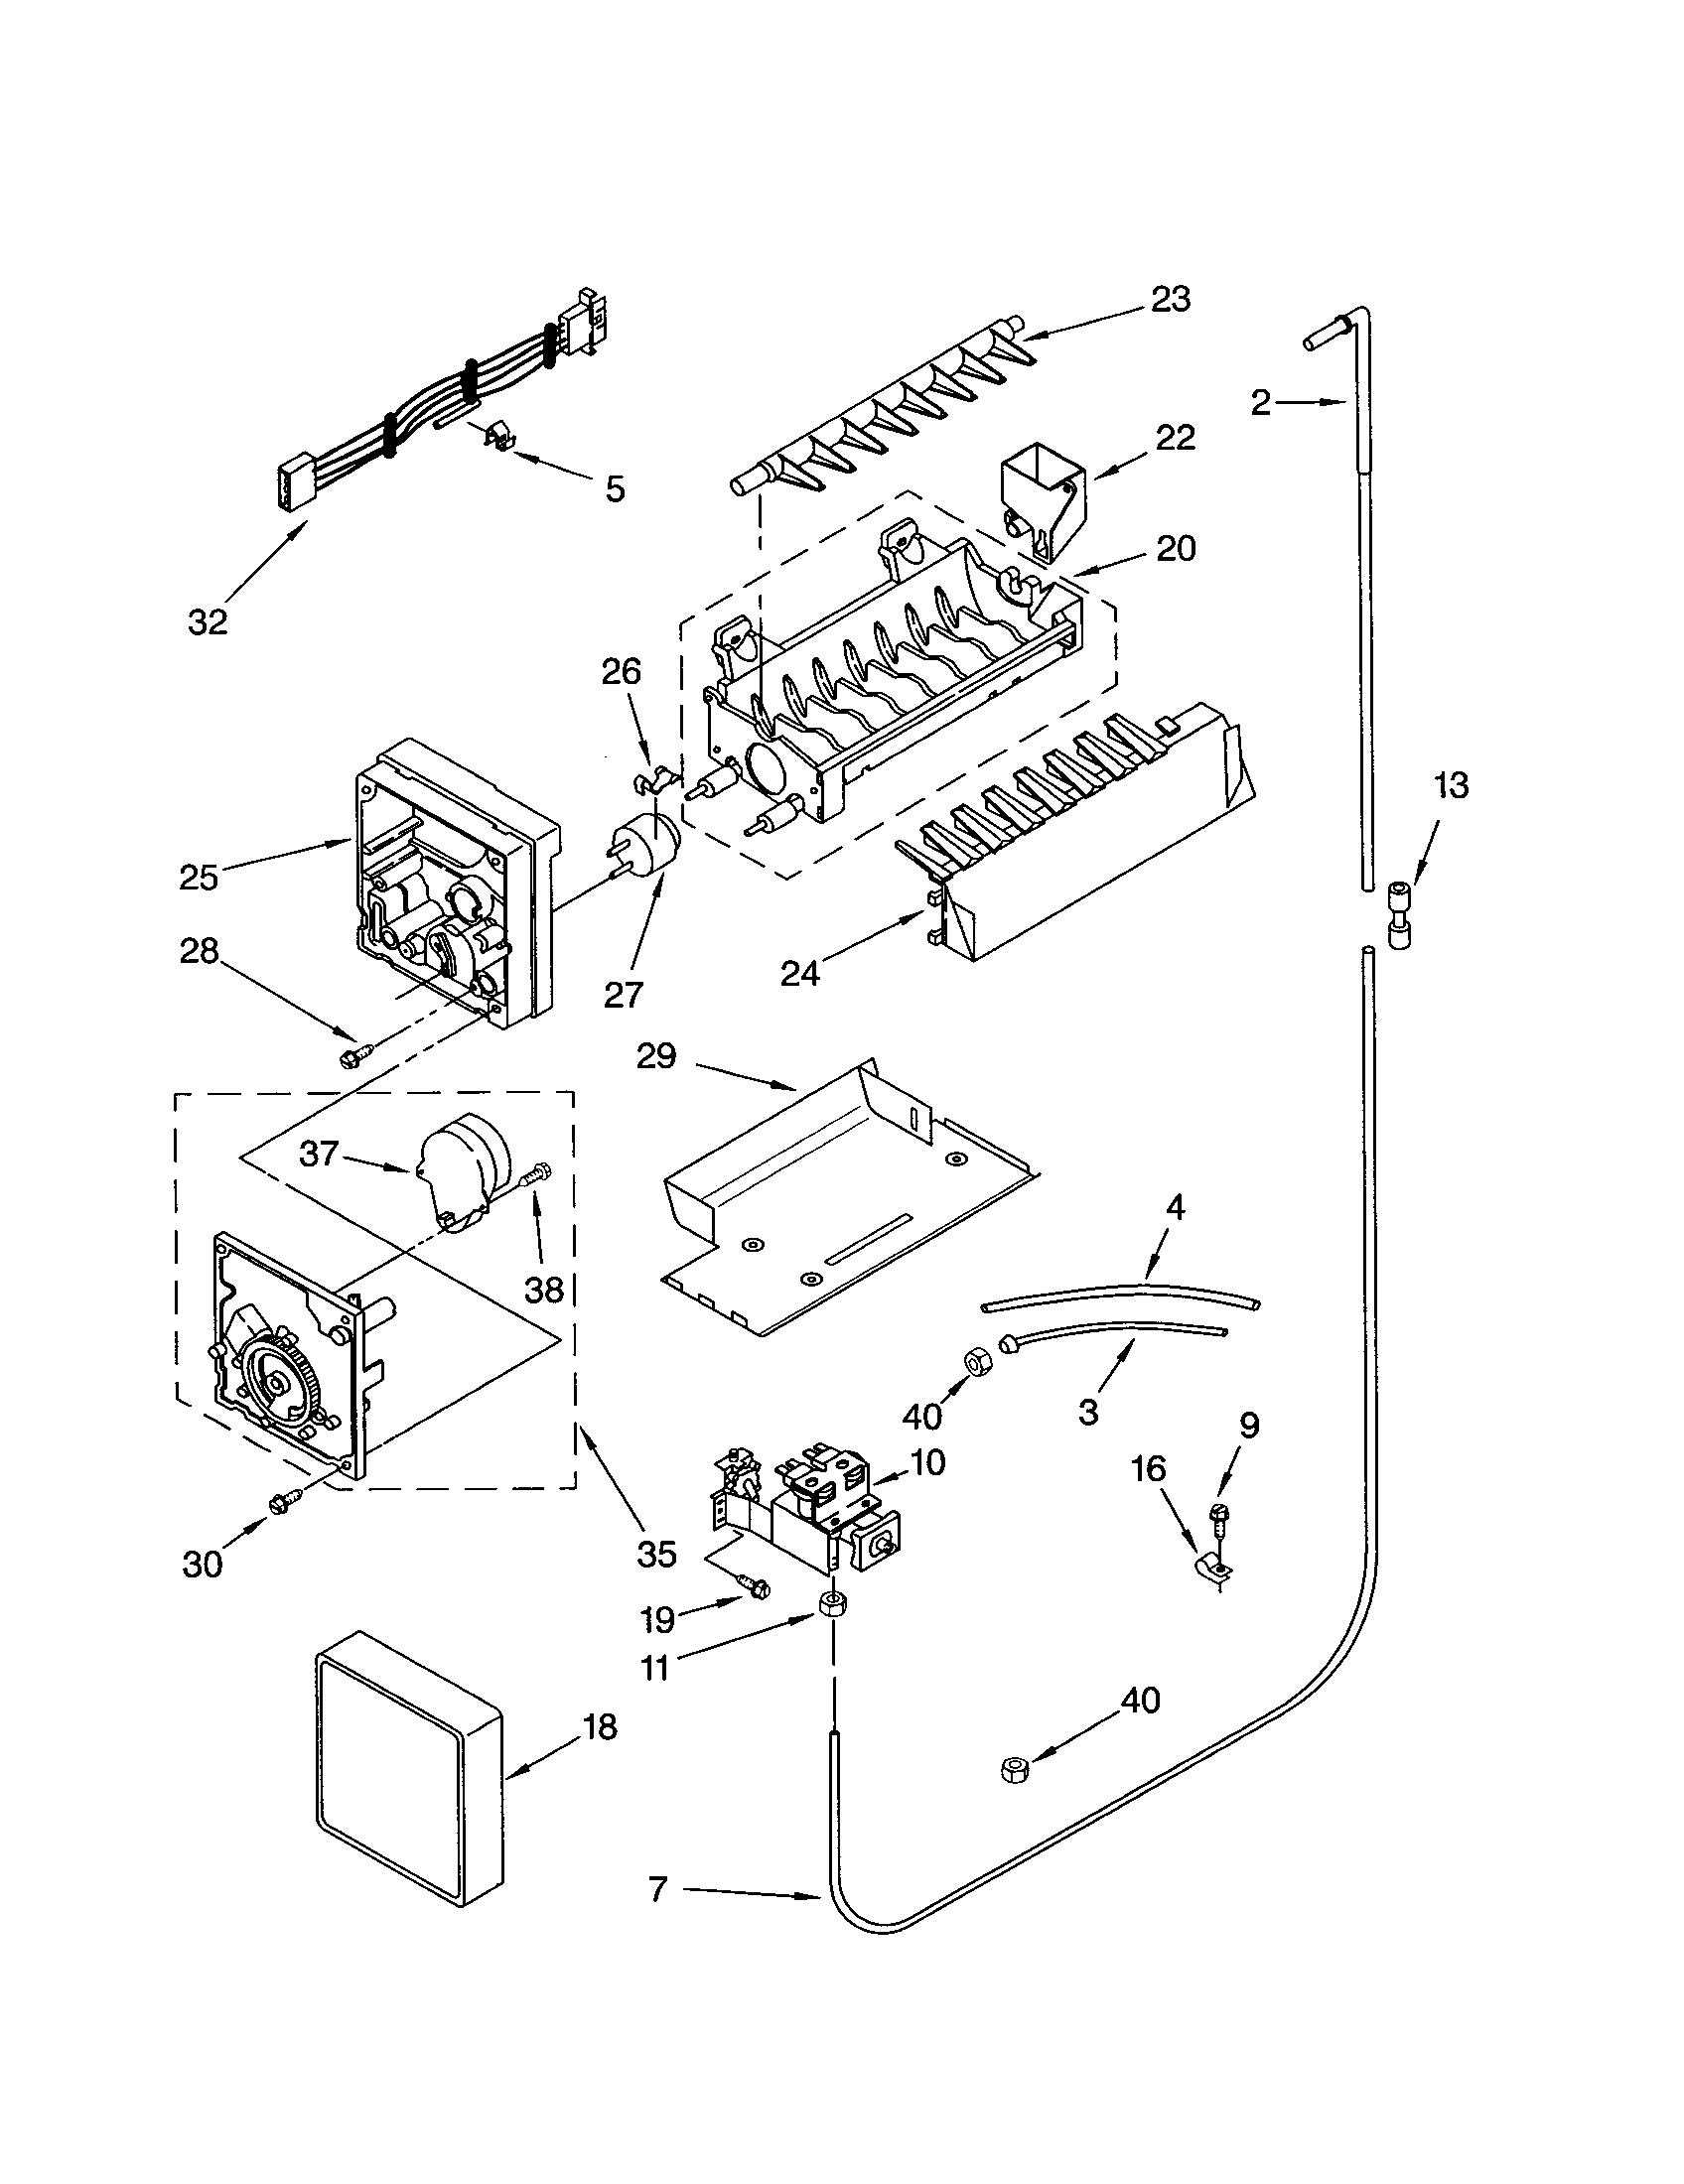 how a freezer works diagram 3 way wiring diagrams refrigerators parts refrigerator door